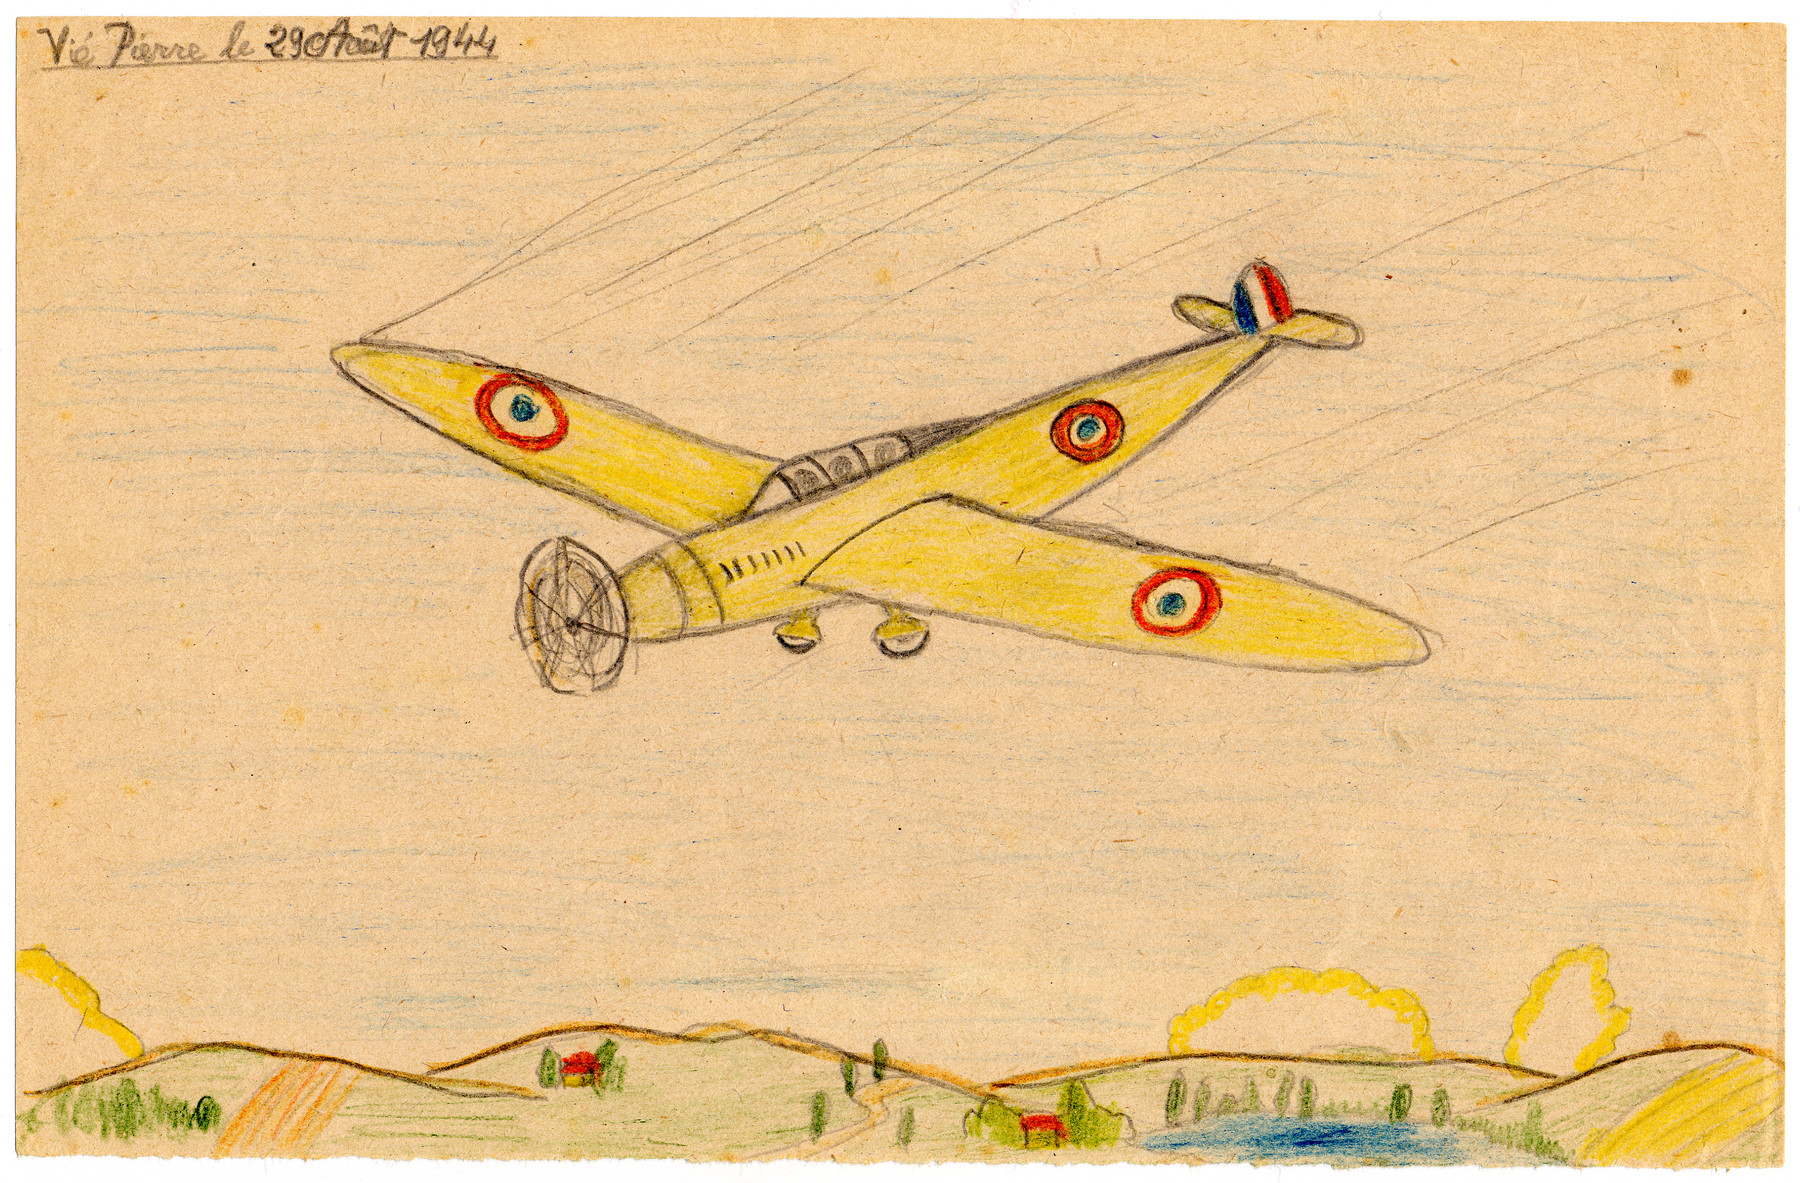 A child's drawing of a plane in Chateau de la Hille.